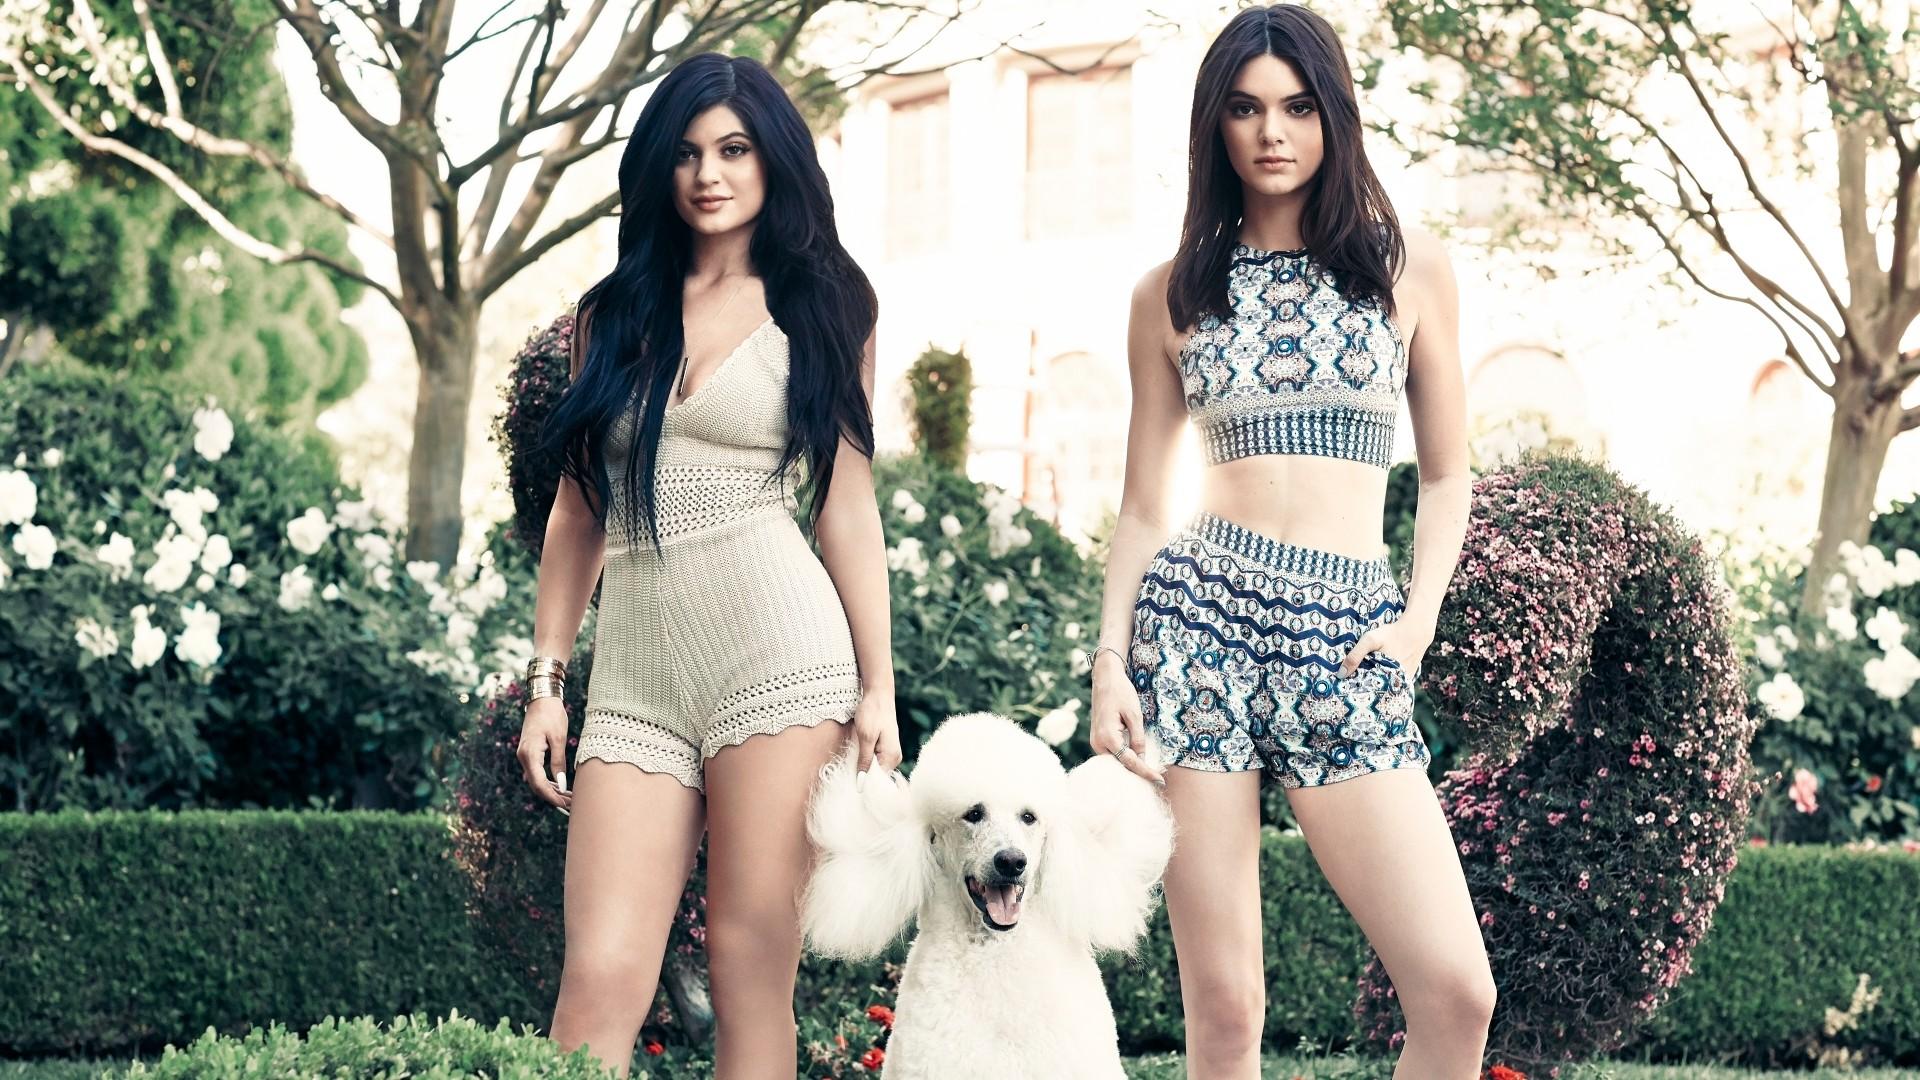 Dua Lipa Iphone X Wallpaper Kylie Kendall Jenner Sisters 5k Wallpapers Hd Wallpapers